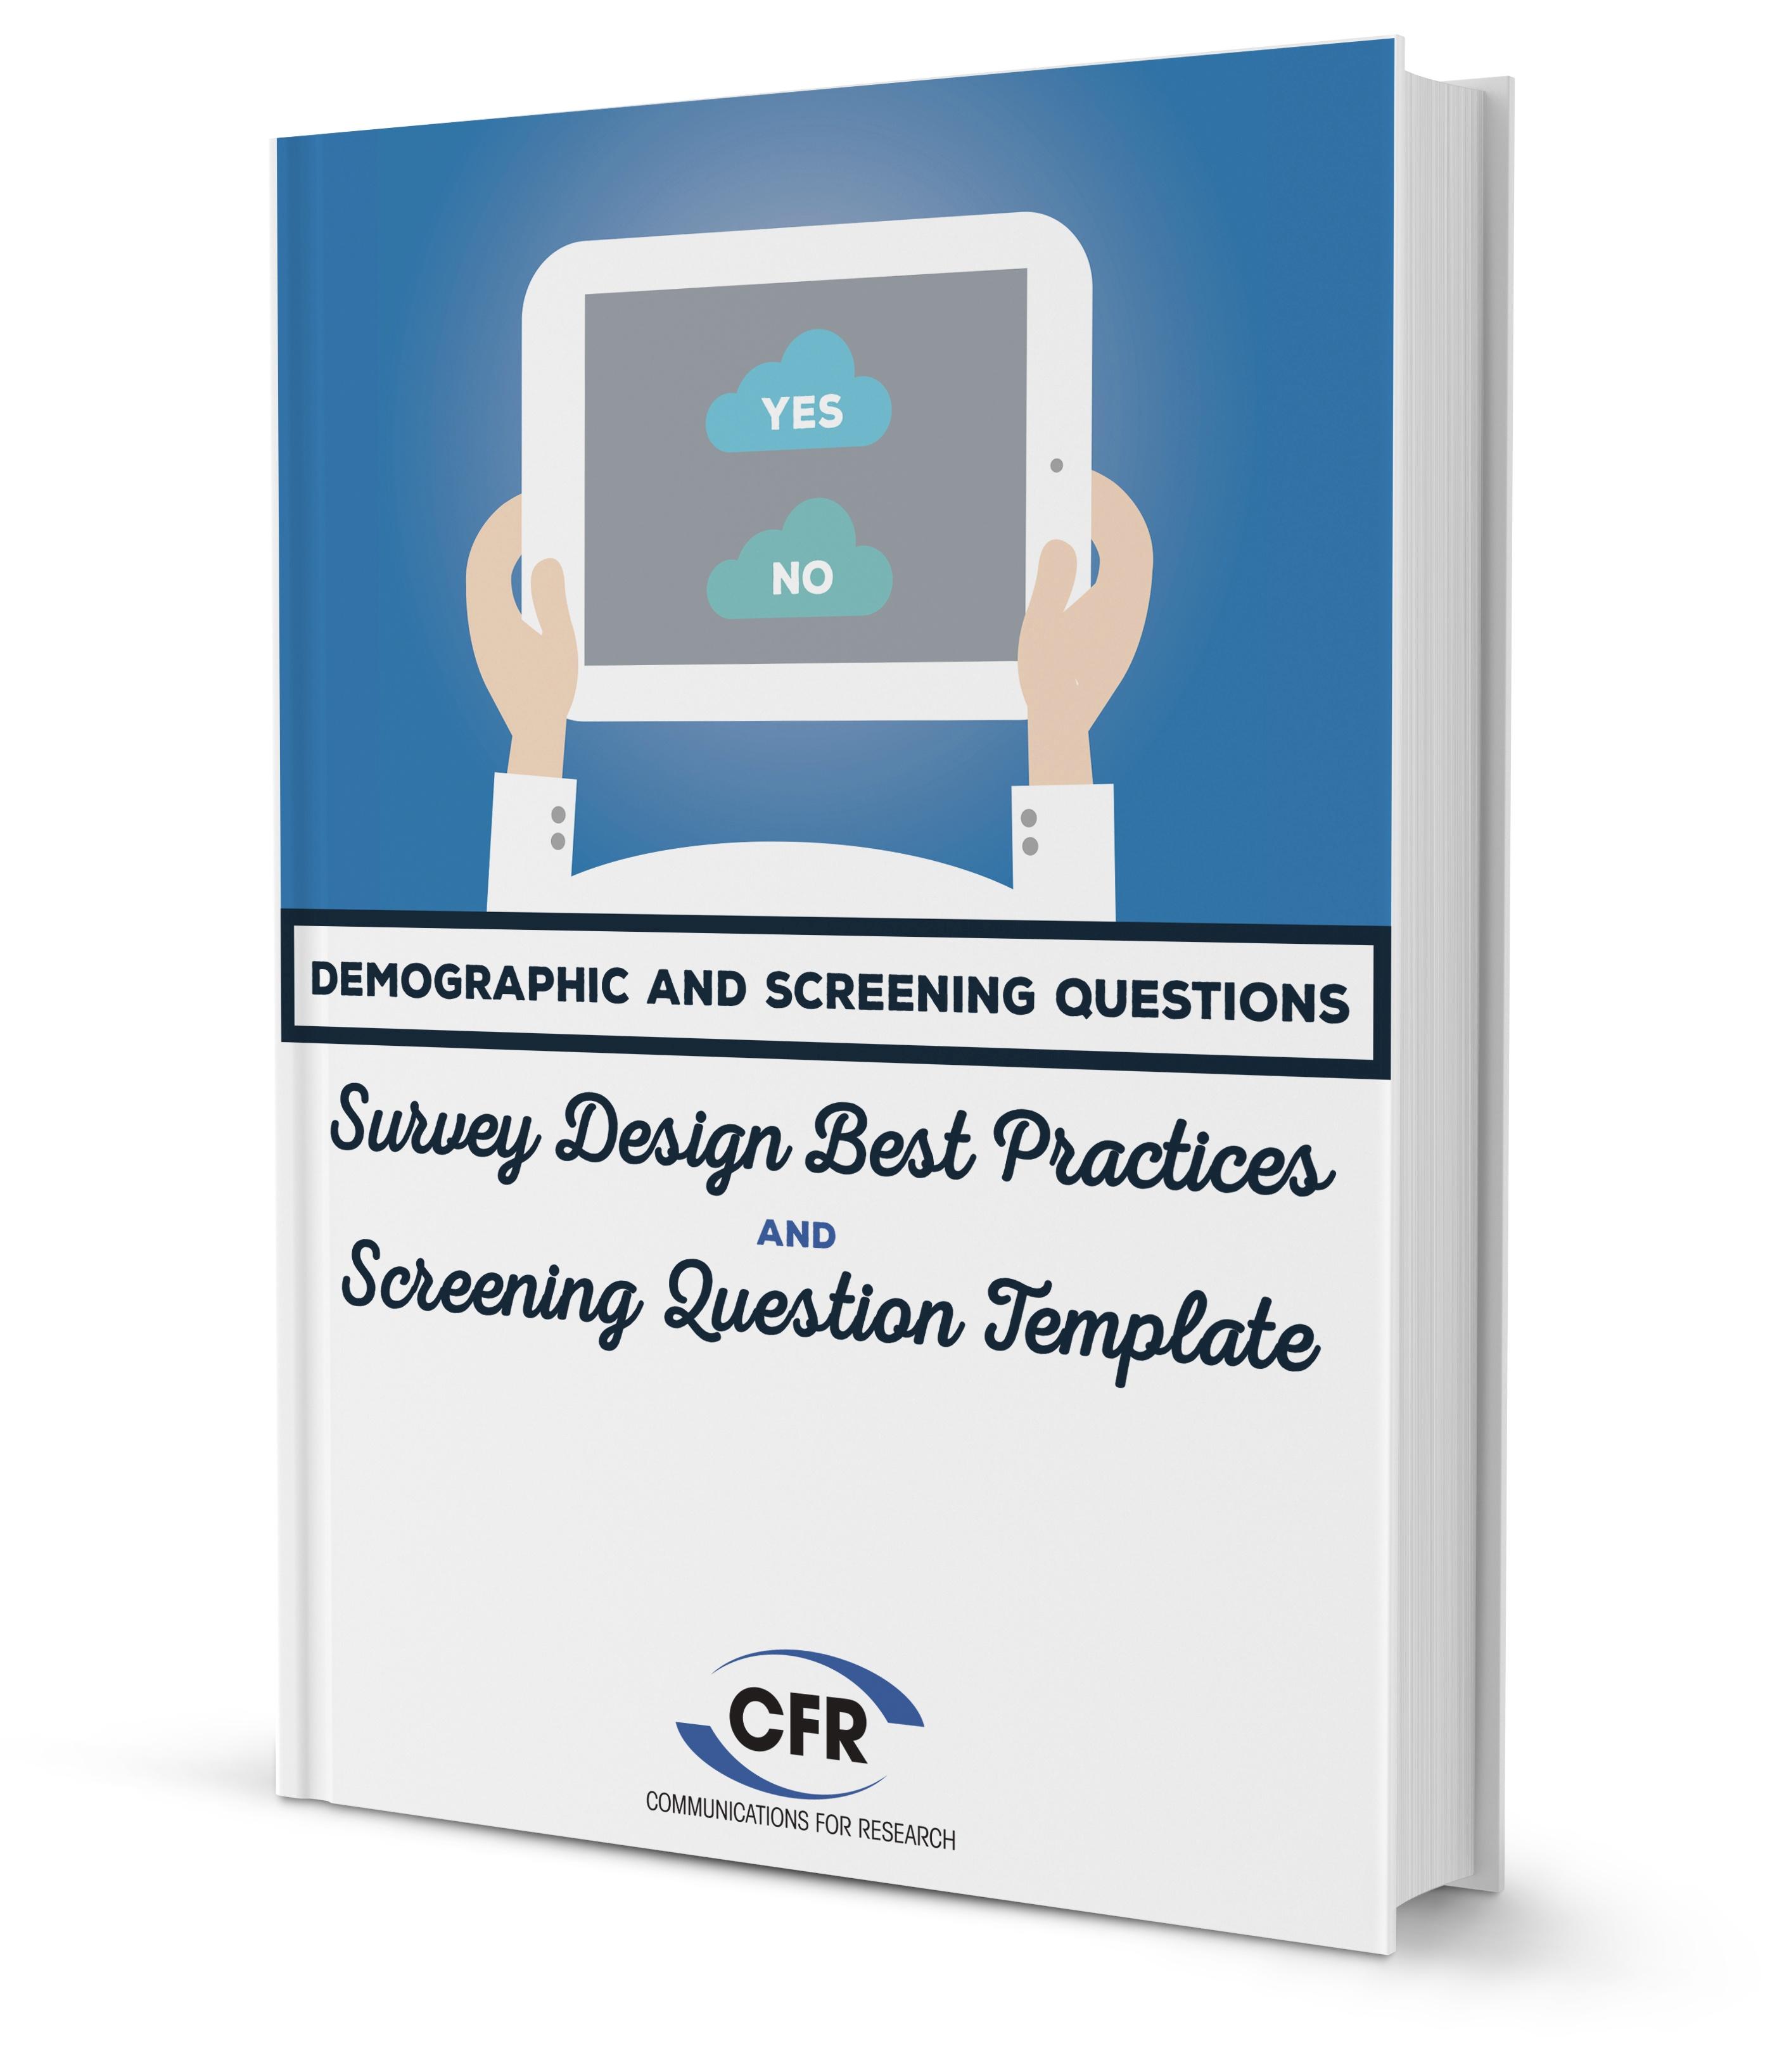 survey-design-best-practices-listing.jpg